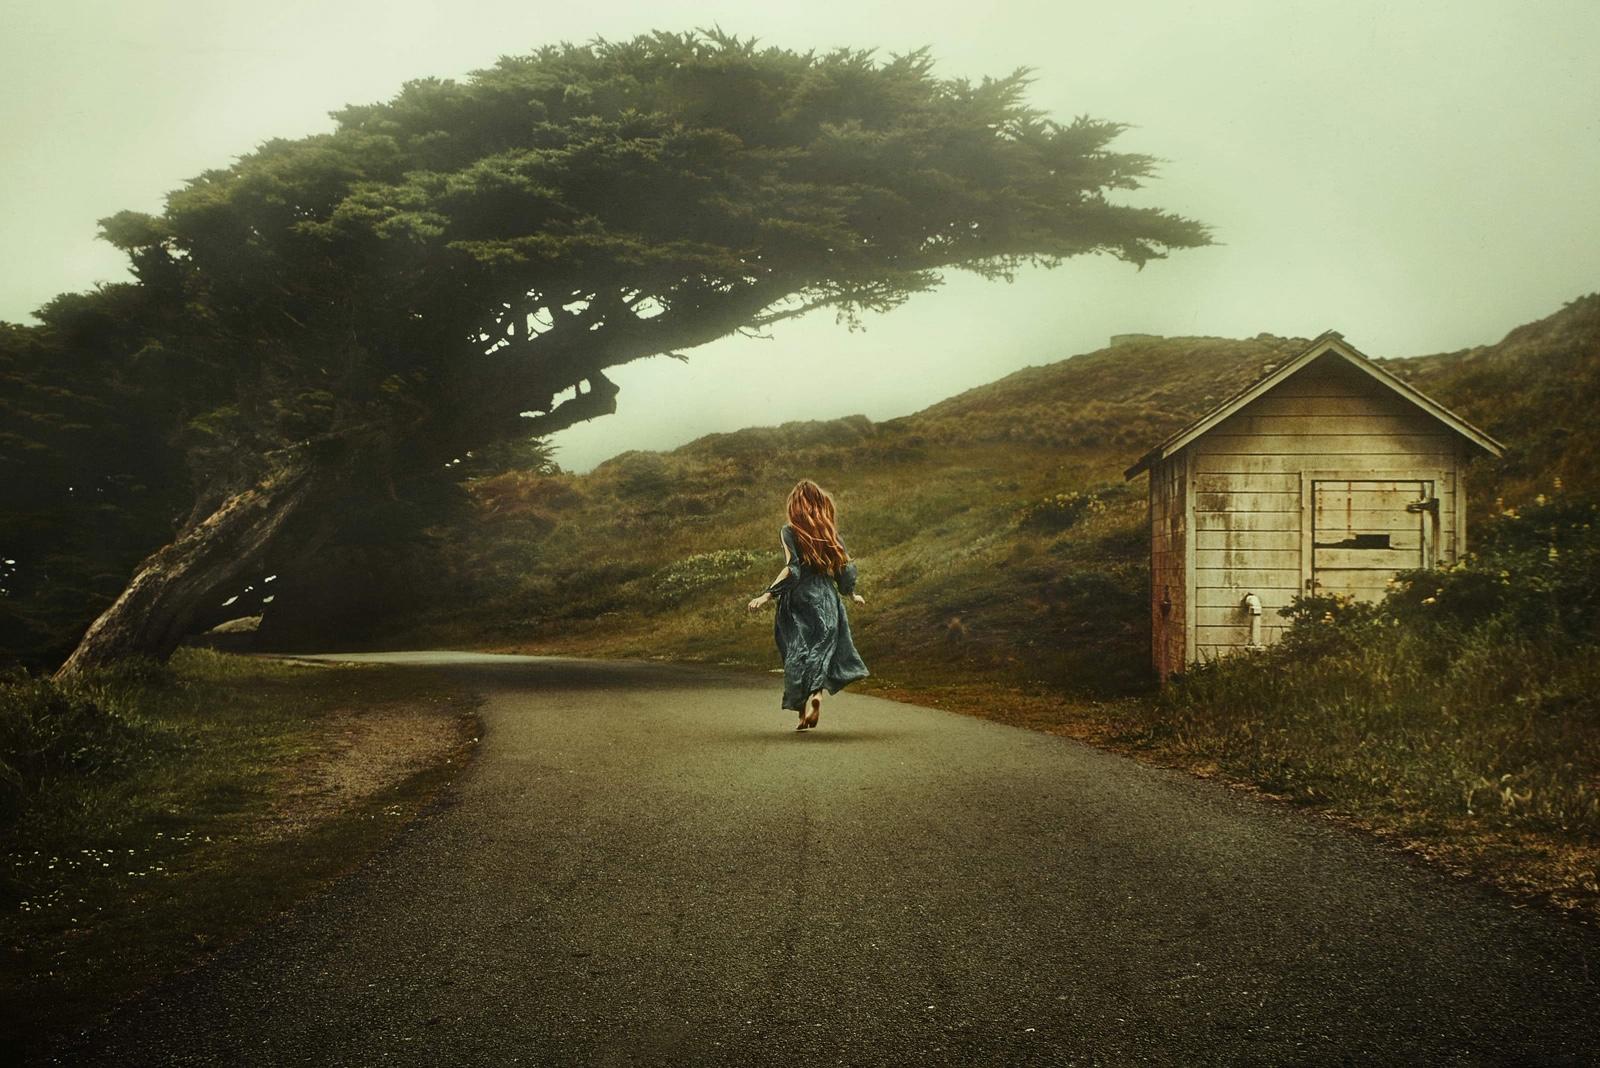 A woman walking away in a dark blue cottagecore dress